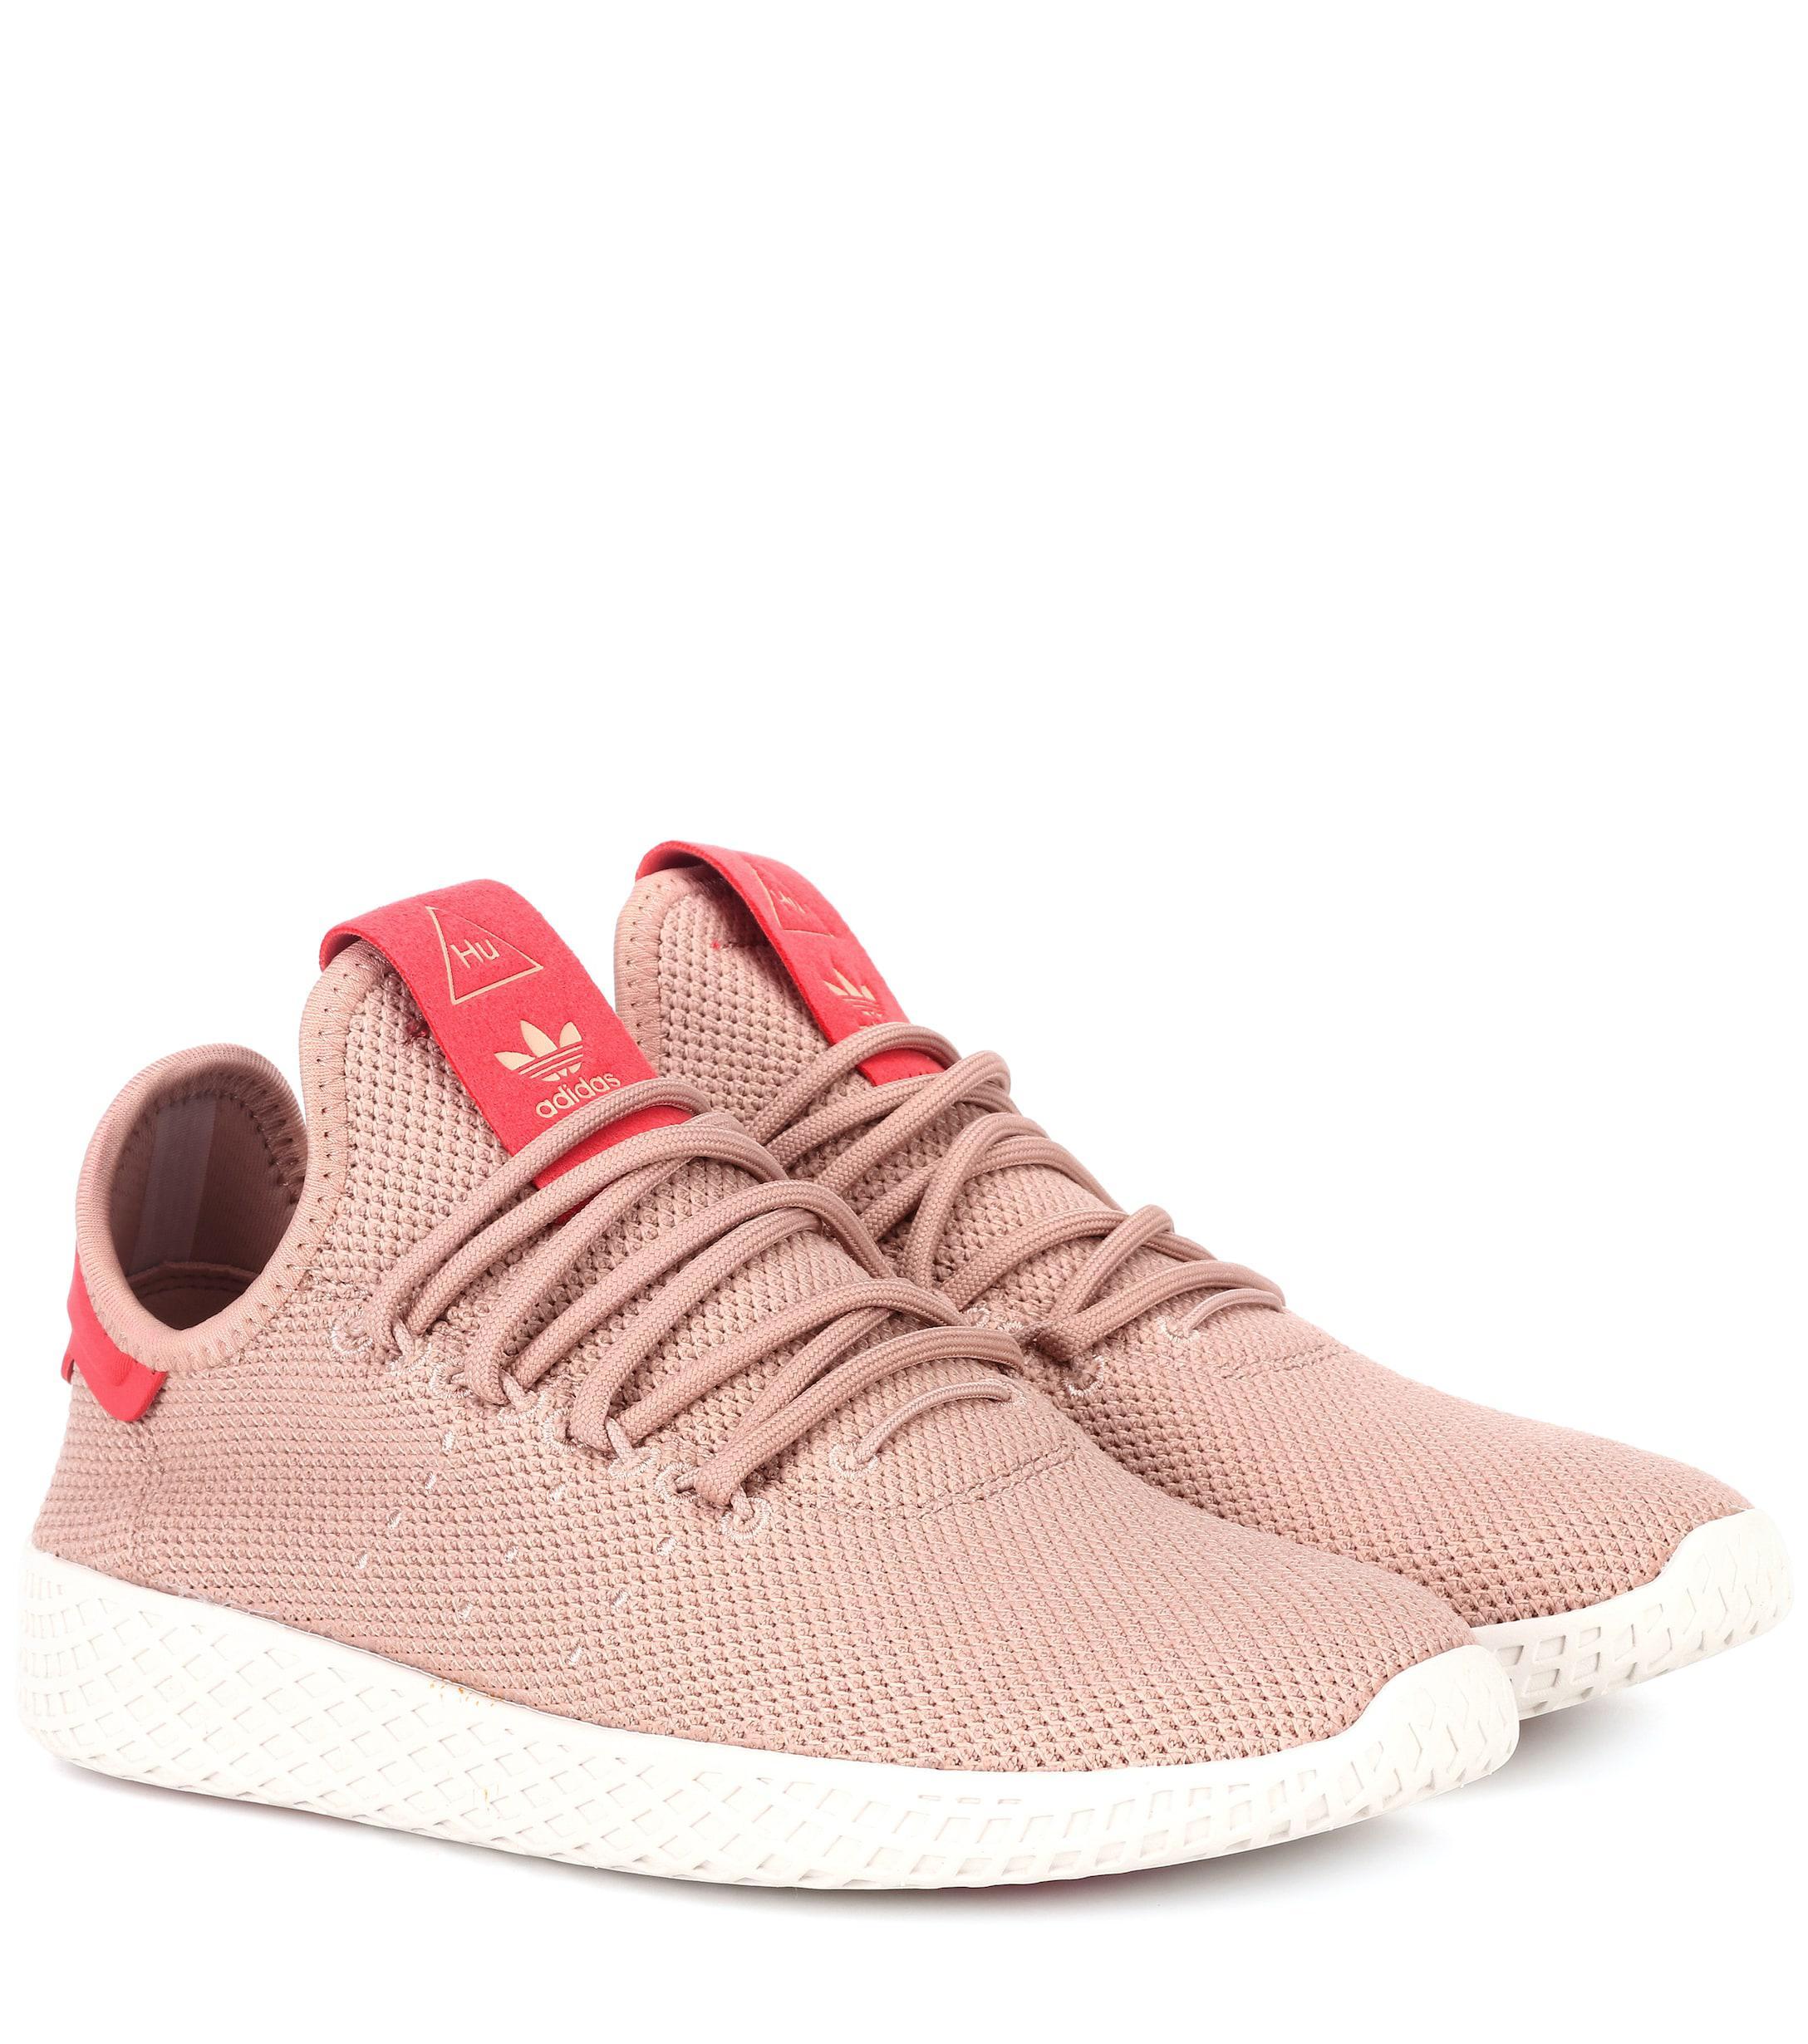 d6a4283de Adidas Originals Pharrell Williams Tennis Hu Sneakers in Pink - Lyst